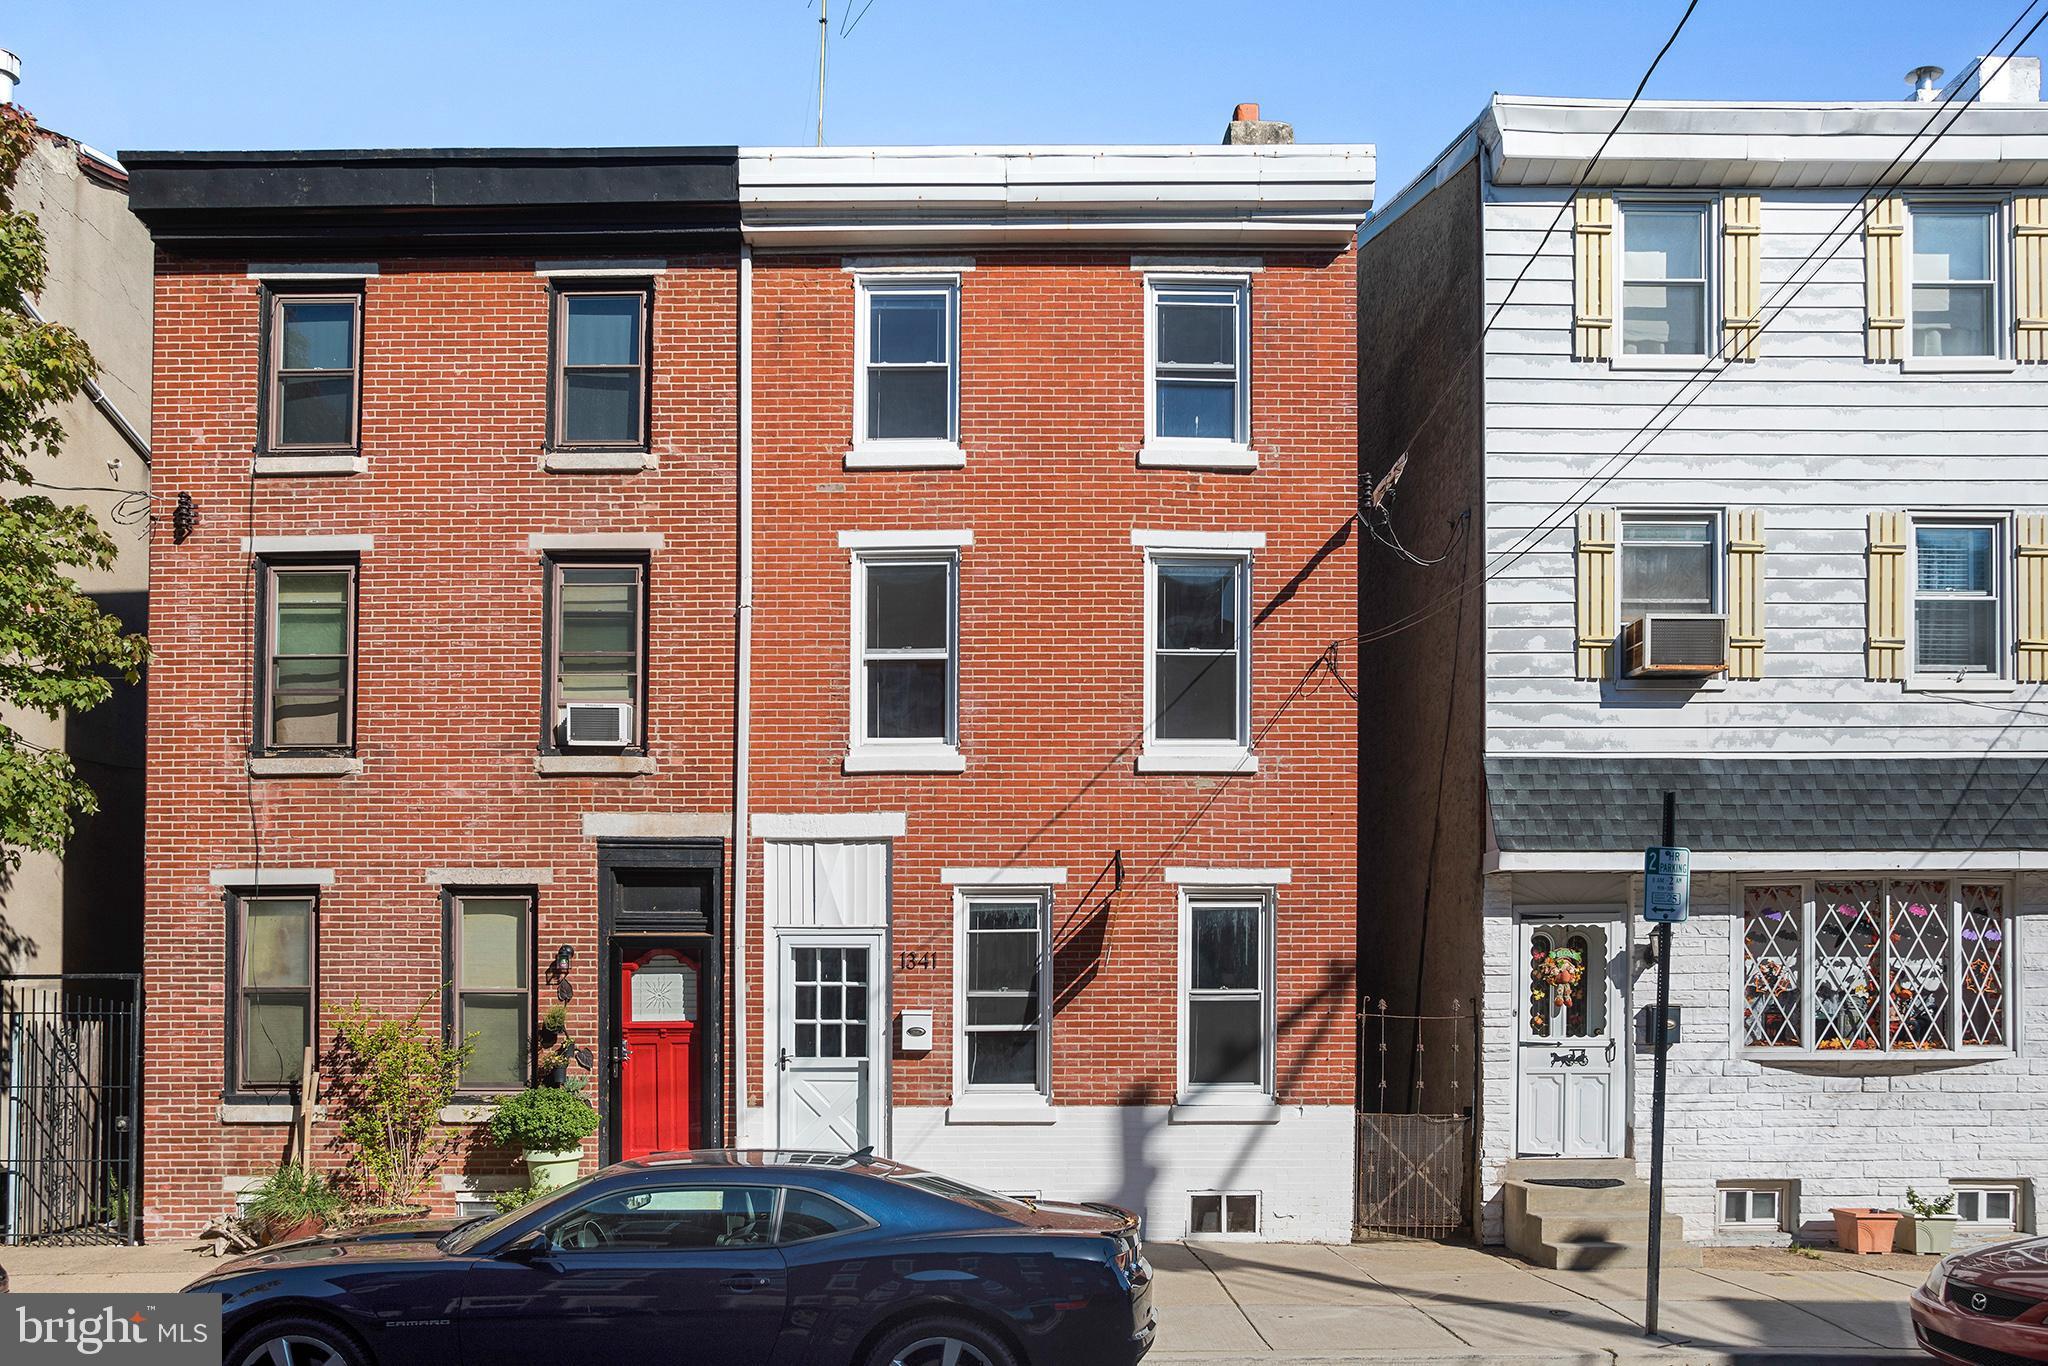 1341 Marlborough Street, Philadelphia, PA 19125